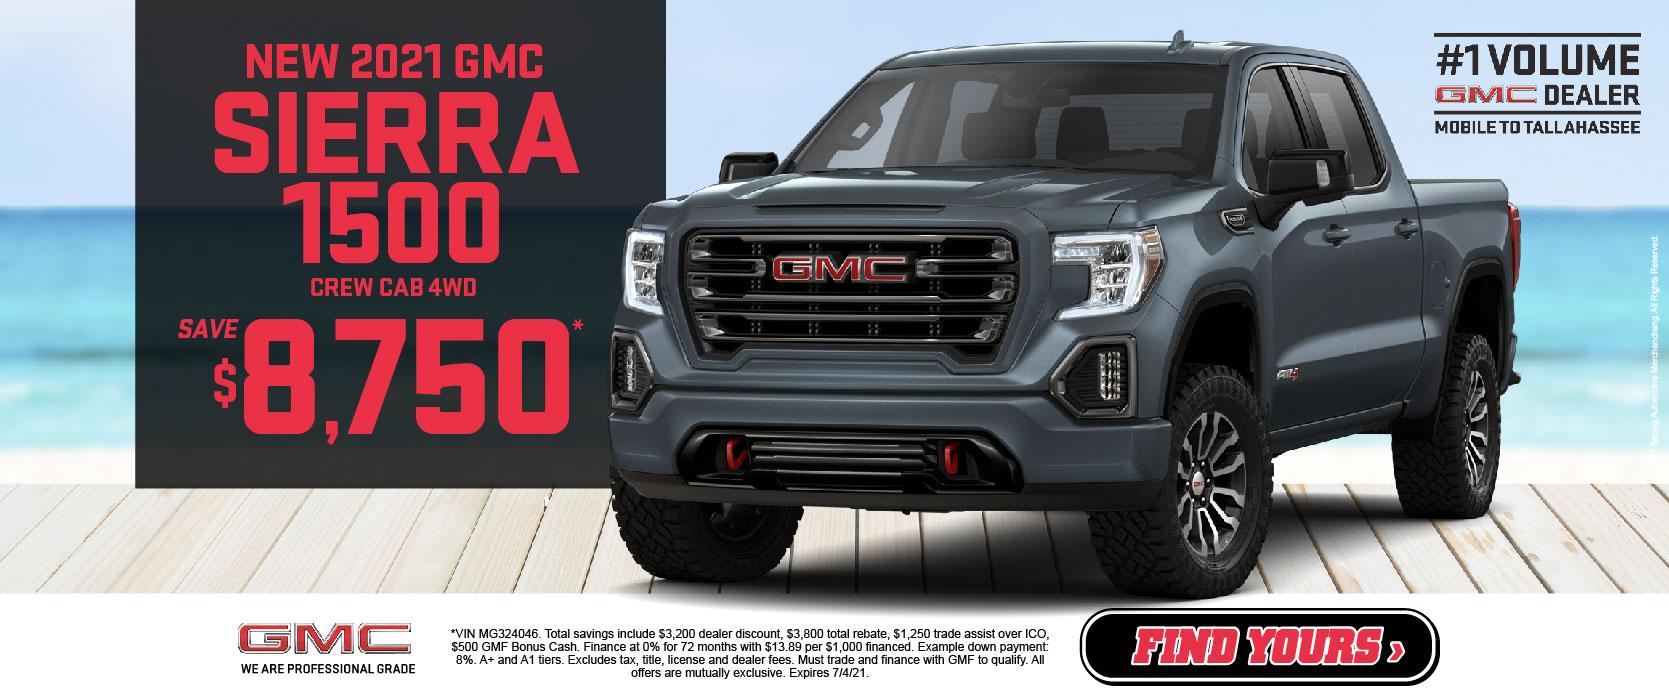 New 2021 GMC Sierra 1500 - Save $8,750